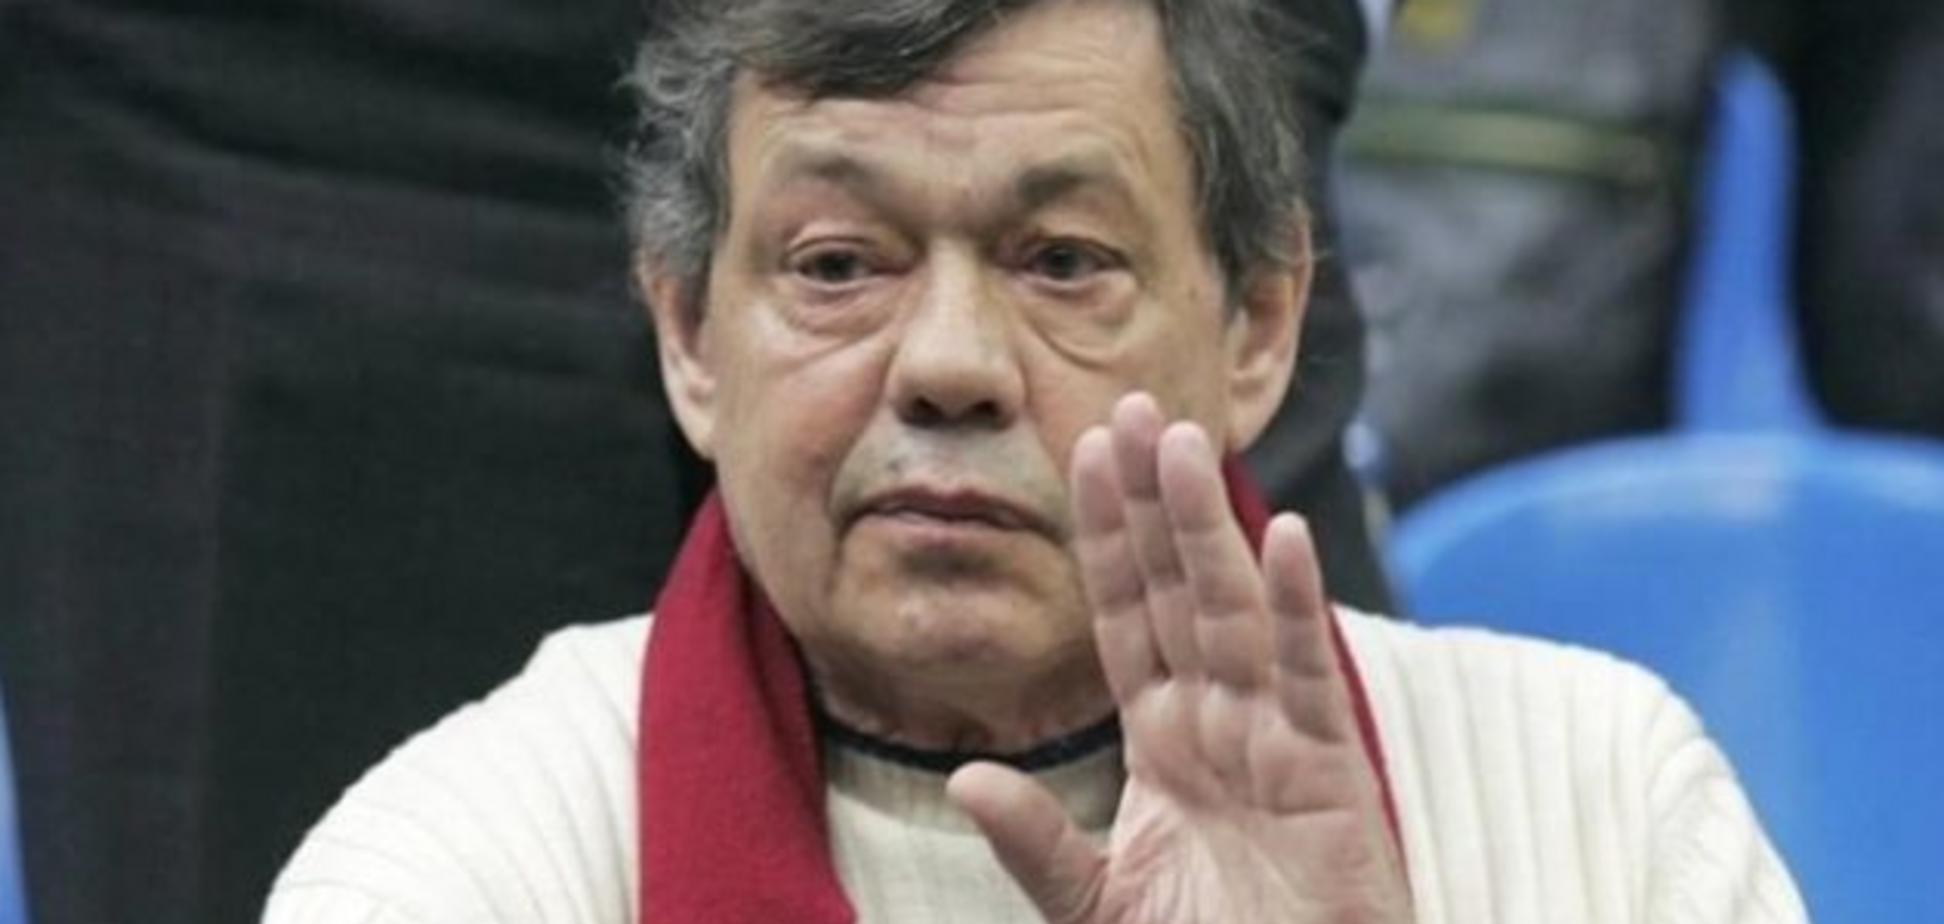 Микола Караченцов